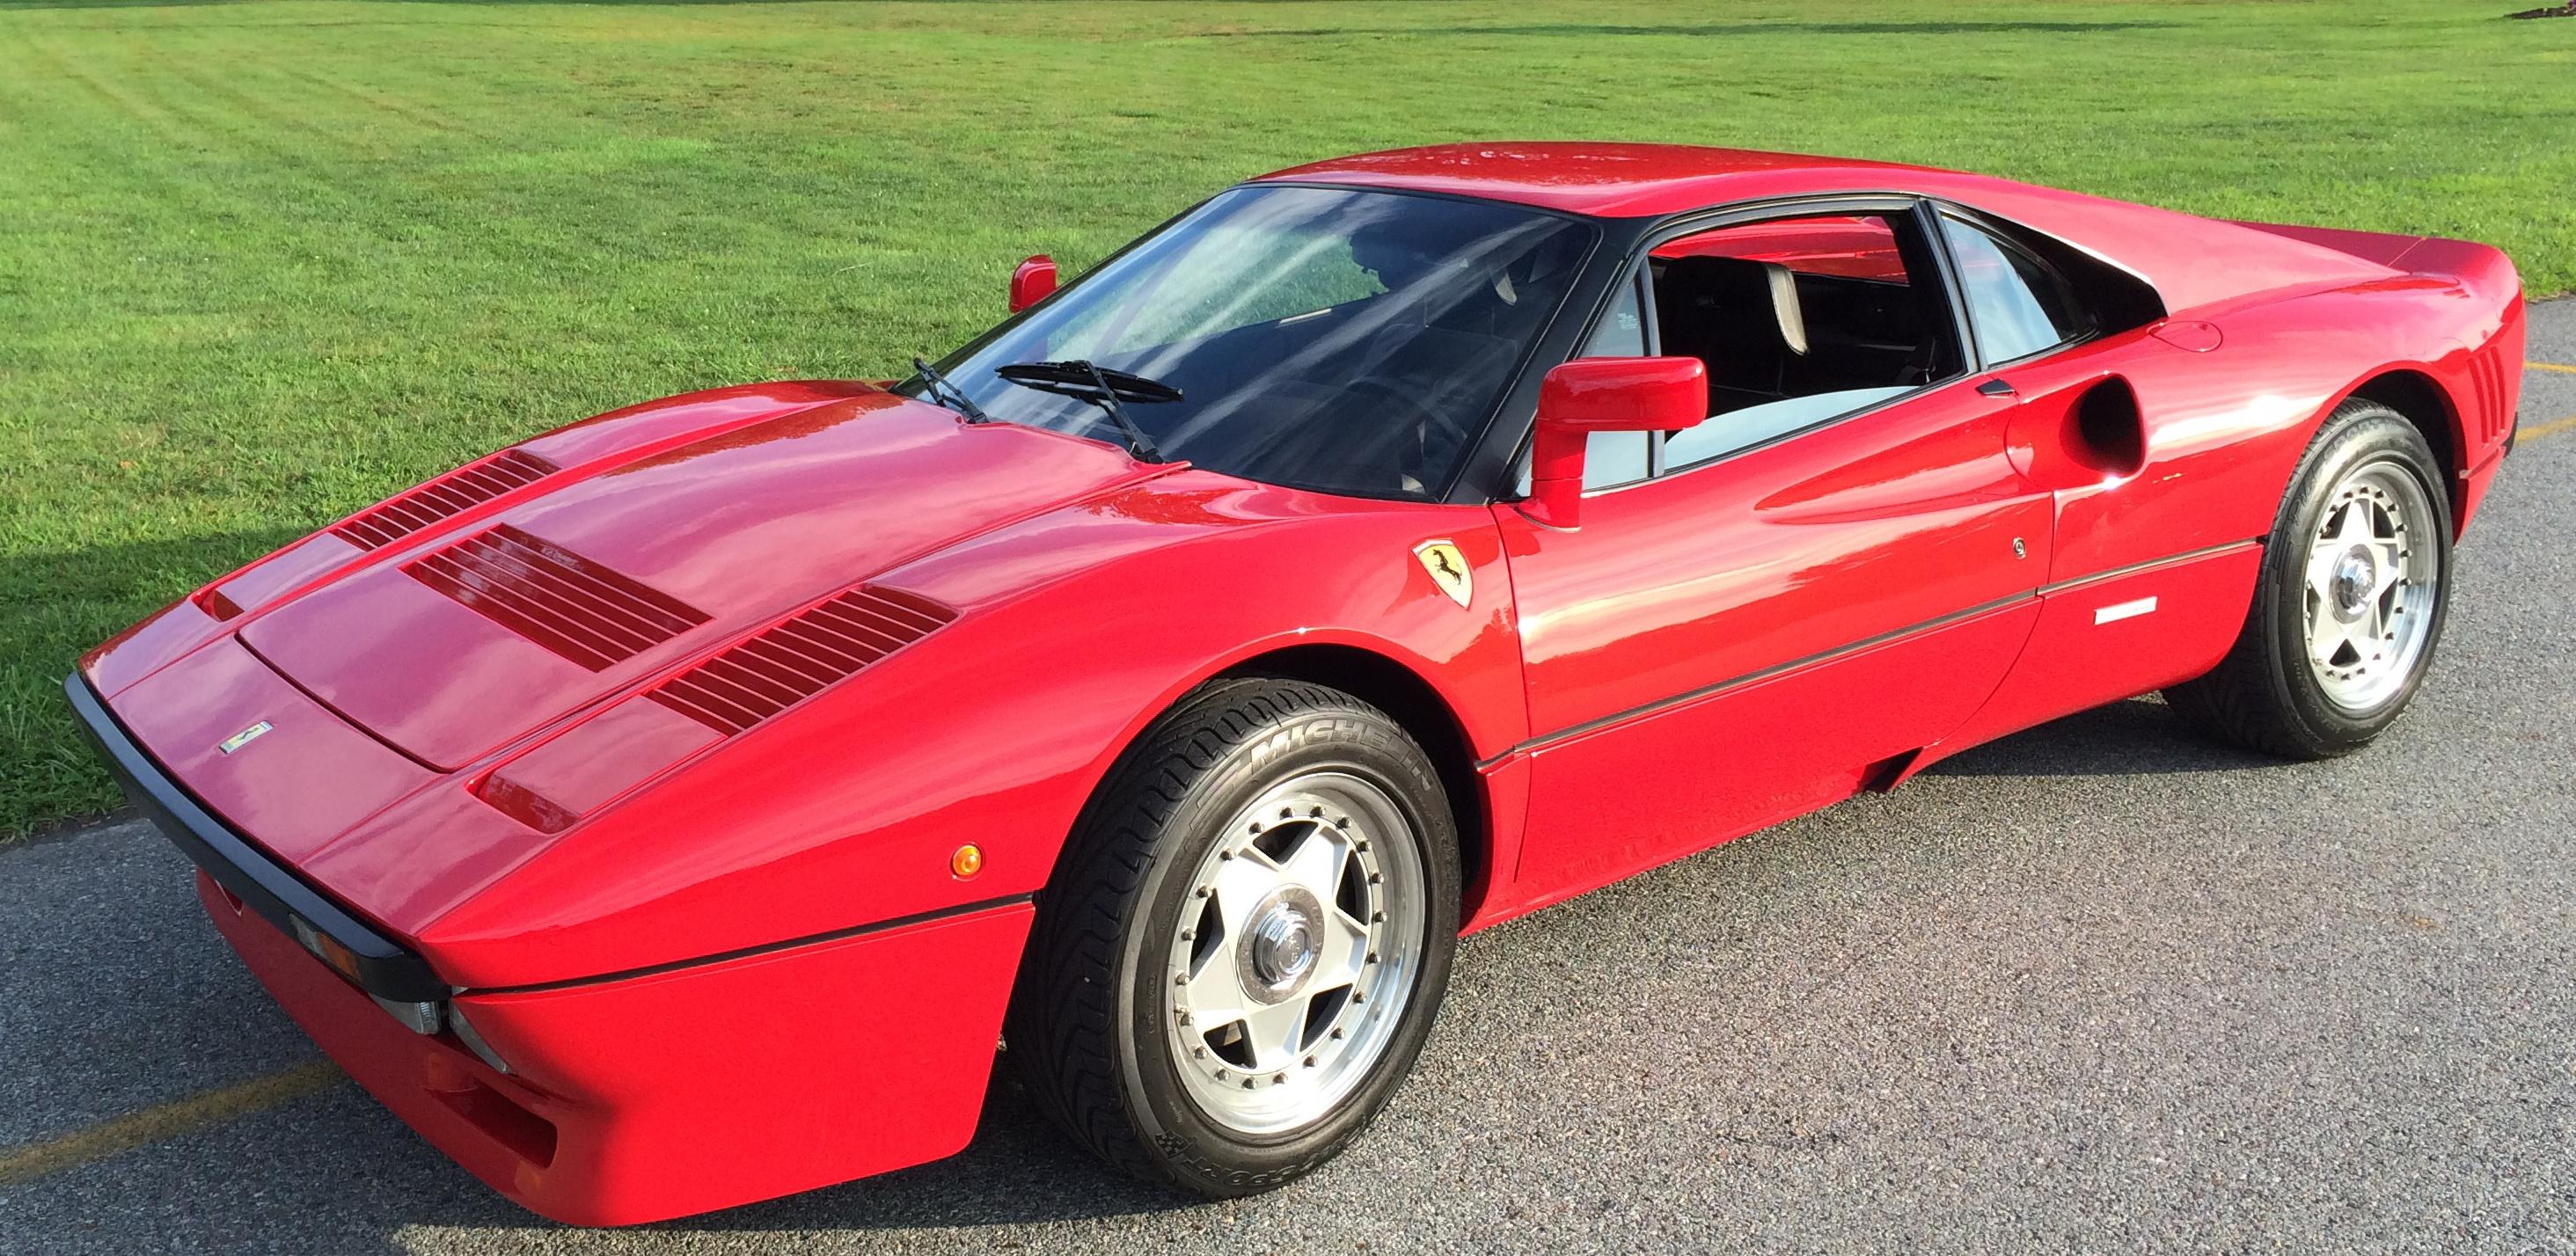 1985 Ferrari 288 Gto Oldtimer Zu Verkaufen